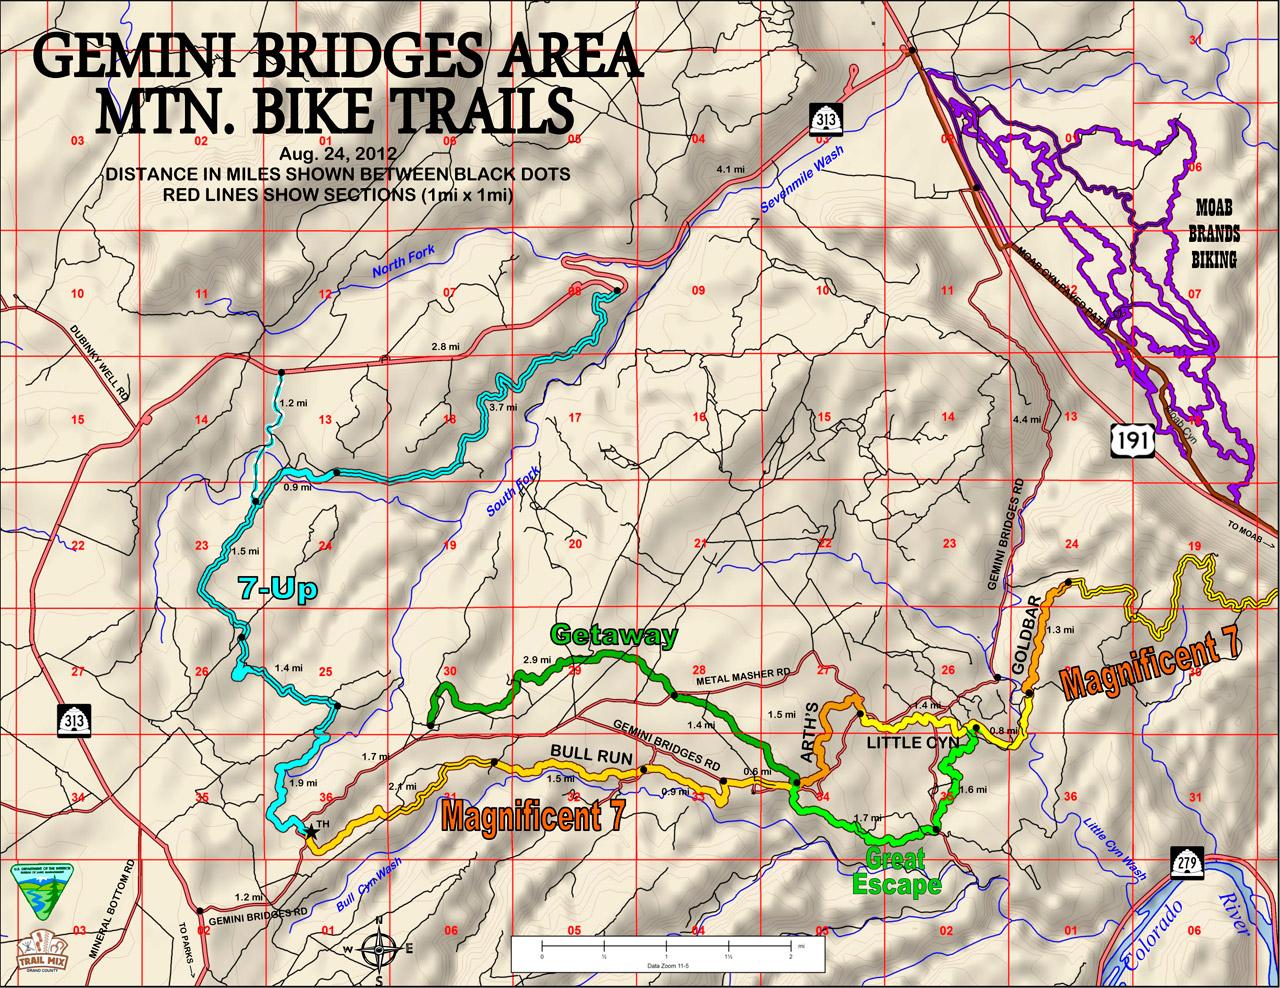 Gemini Bridge Area Trails, Moab Utah - 7-UP, Magnificent 7, Getaway